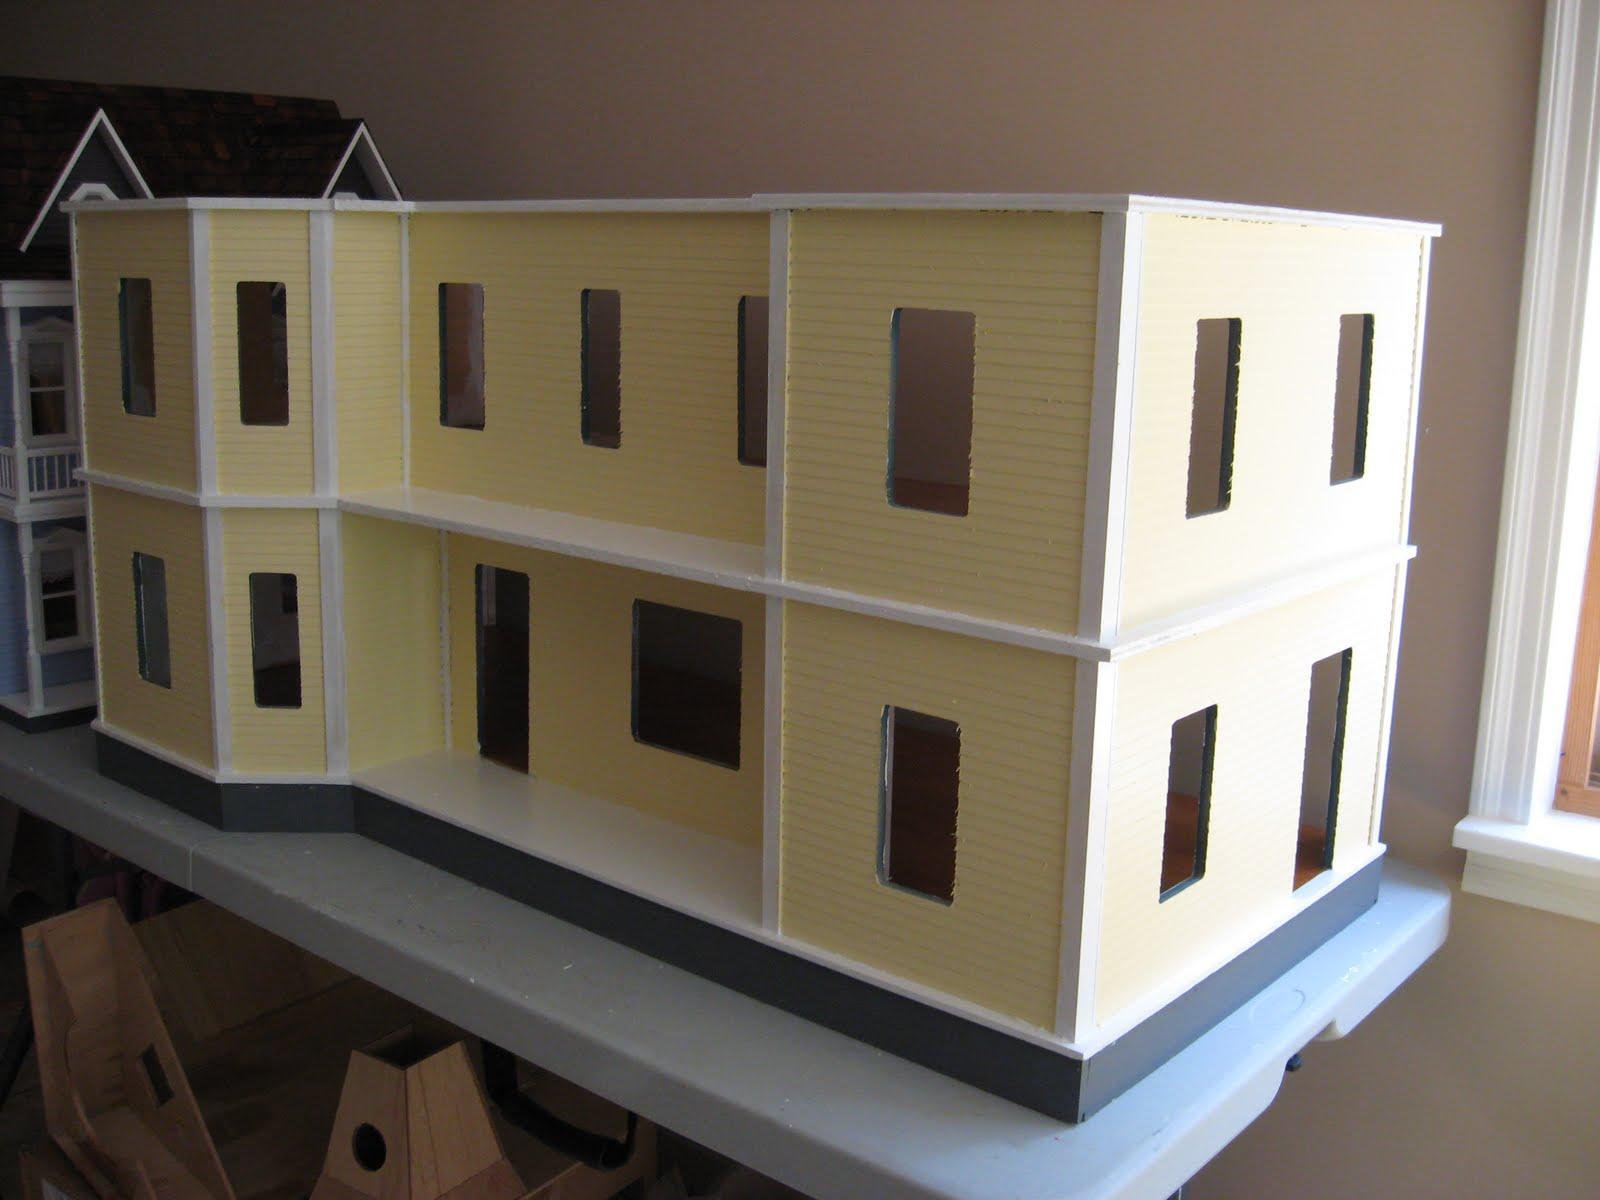 50+] Dollhouse Finishing Wallpaper and Paint on WallpaperSafari